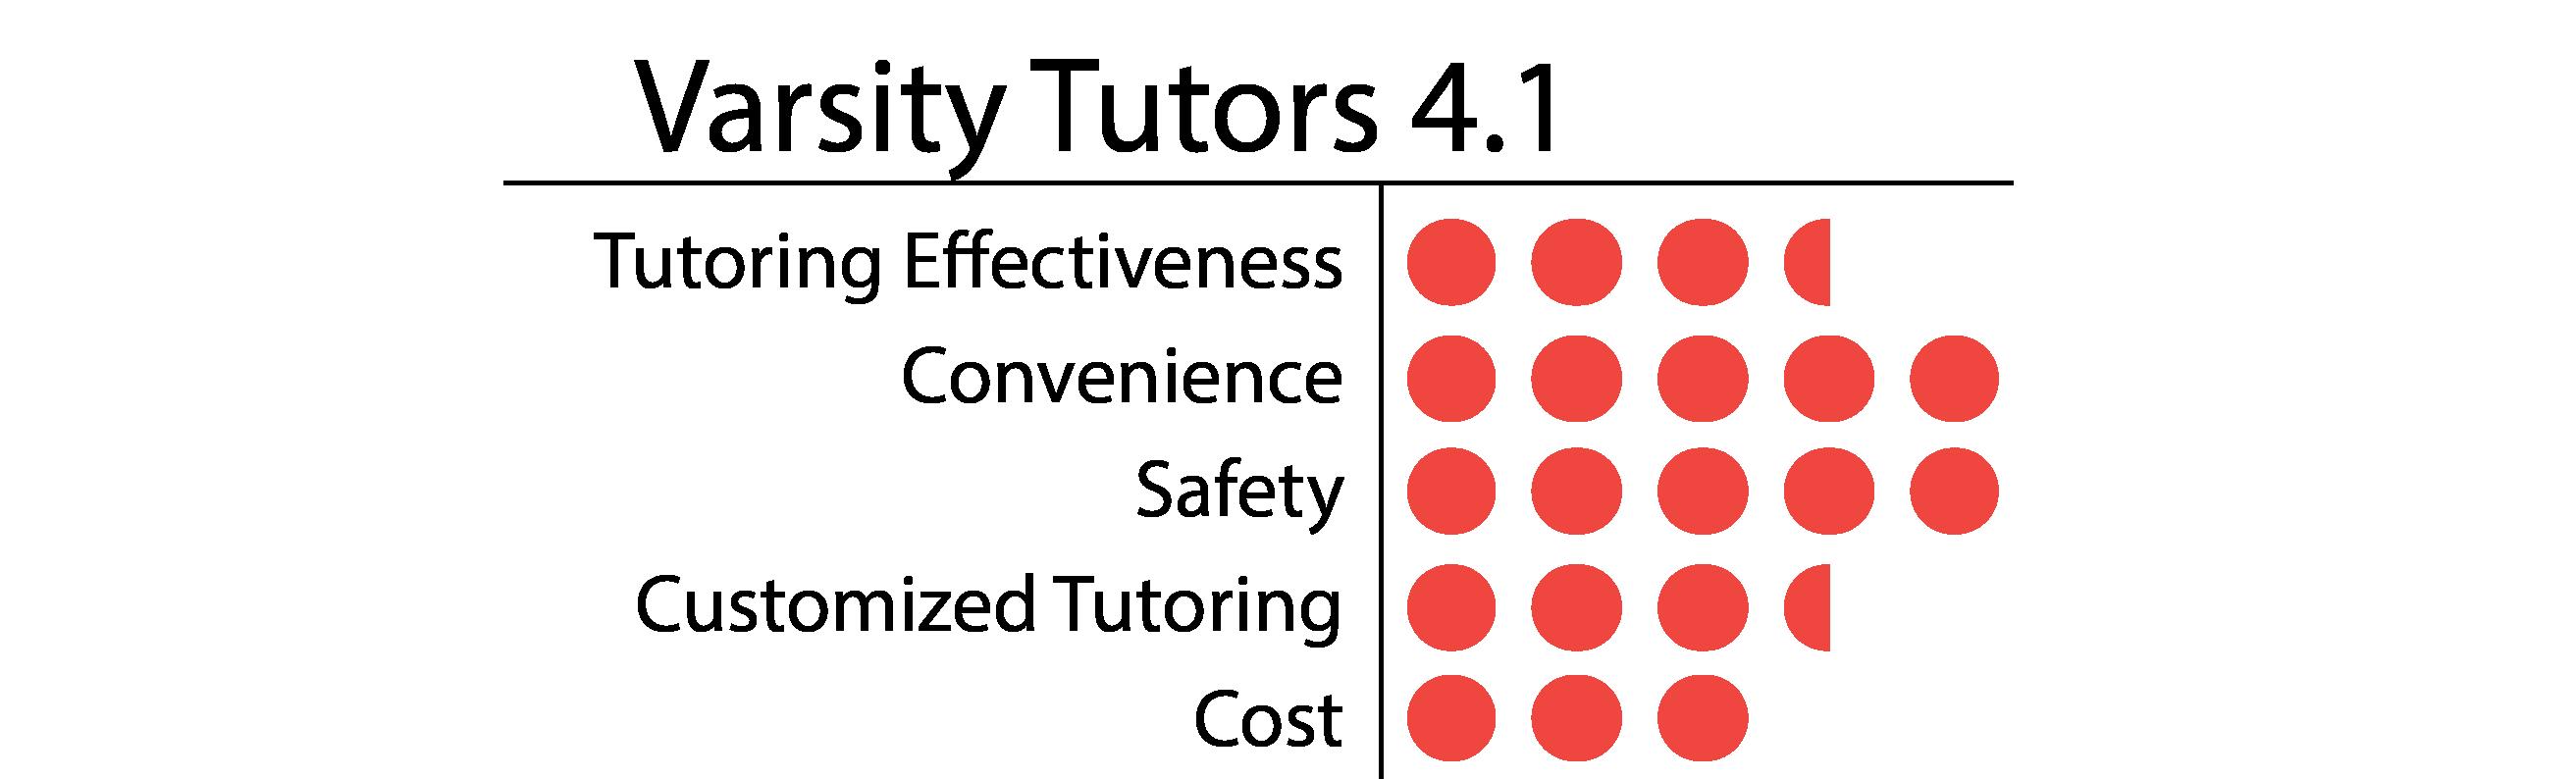 Varsity Tutors-01